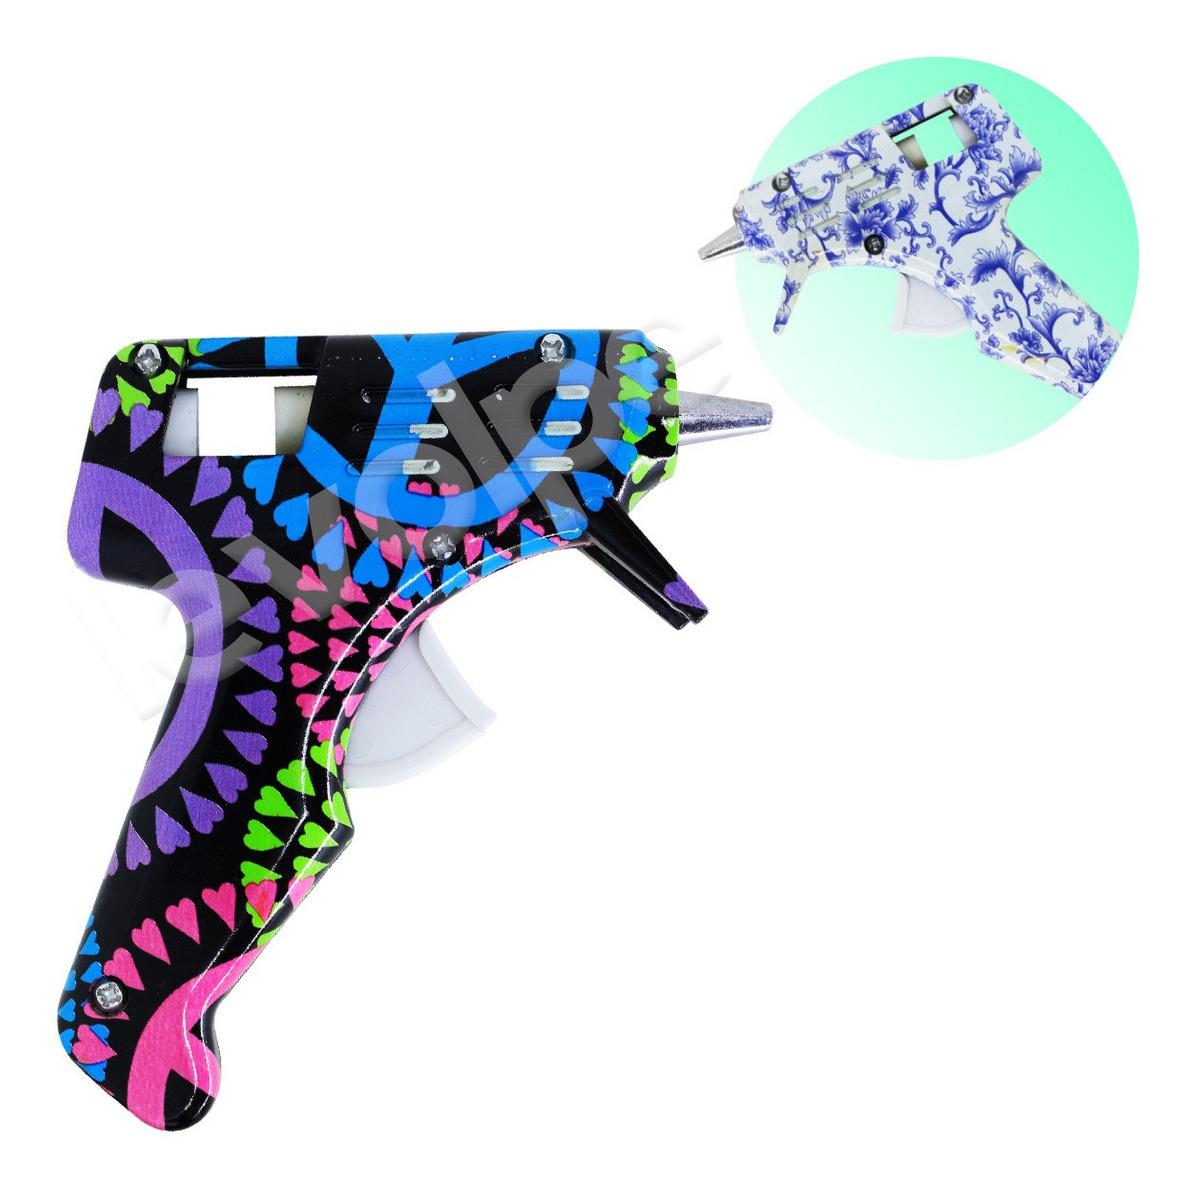 Pistola Aplicadora De Cola Quente Estampada 10w